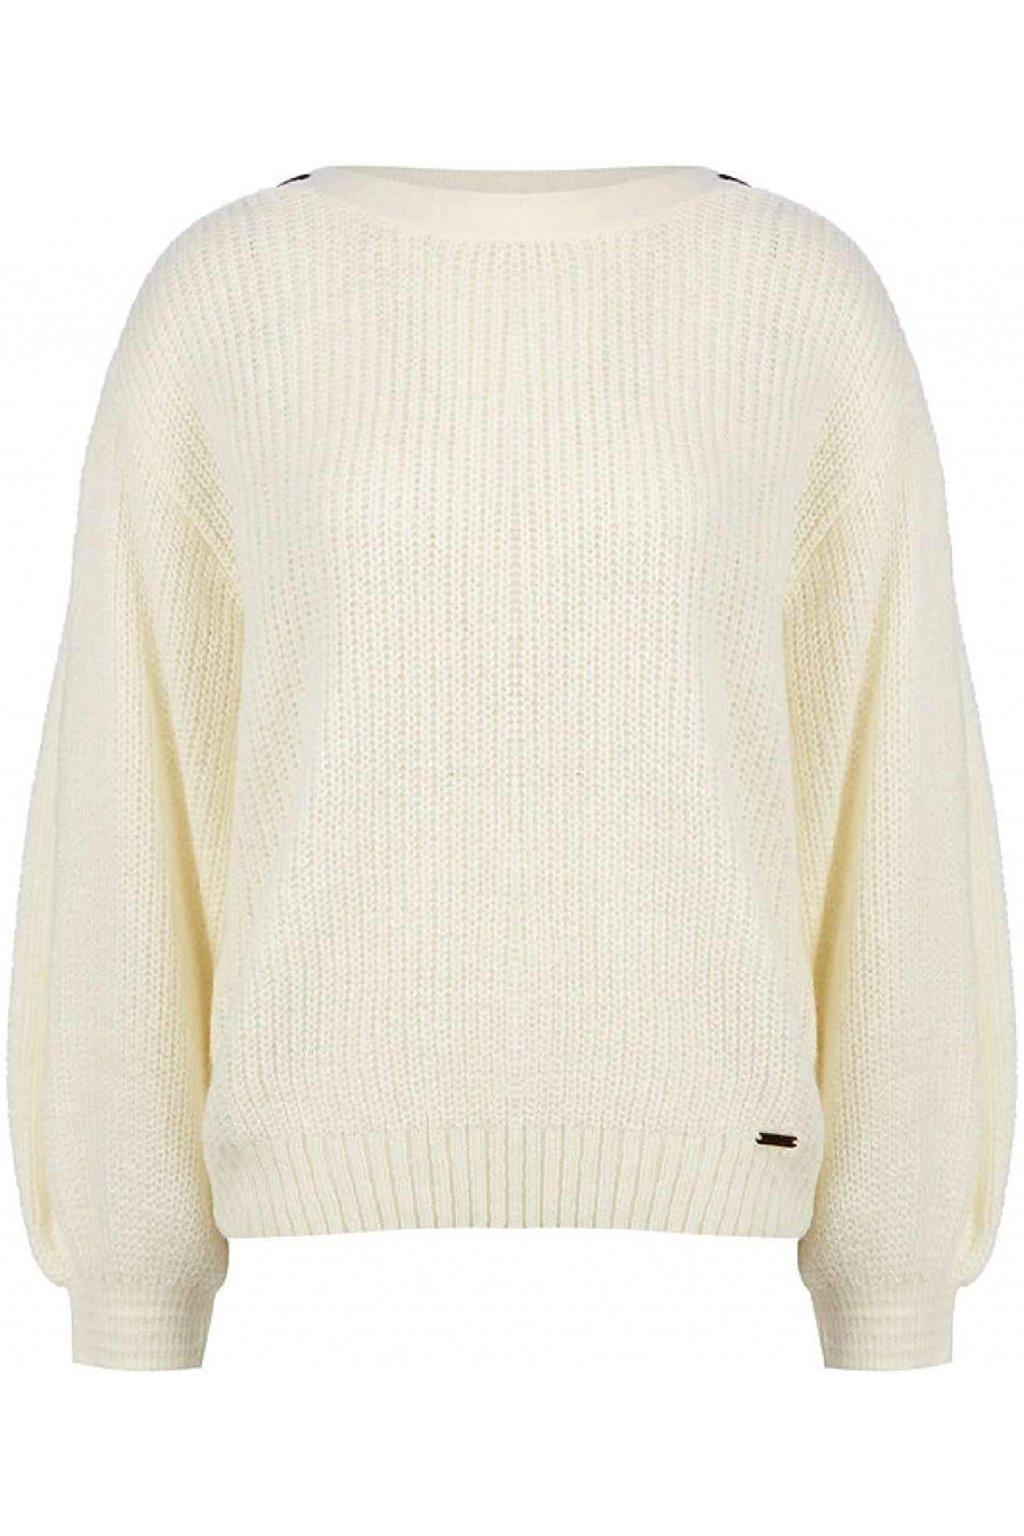 Dámský svetr Pepe Jeans PL701365